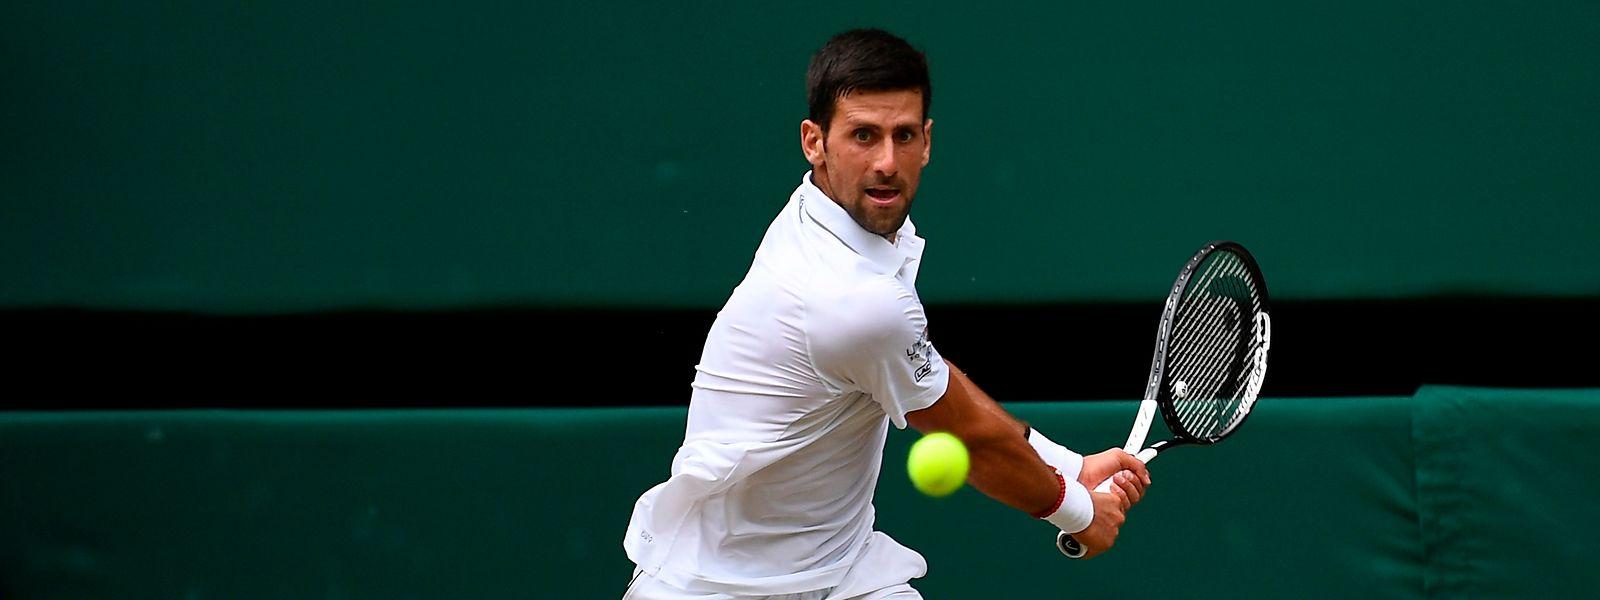 Novak Djokovic disputera ce dimanche sa sixième finale à Wimbledon.